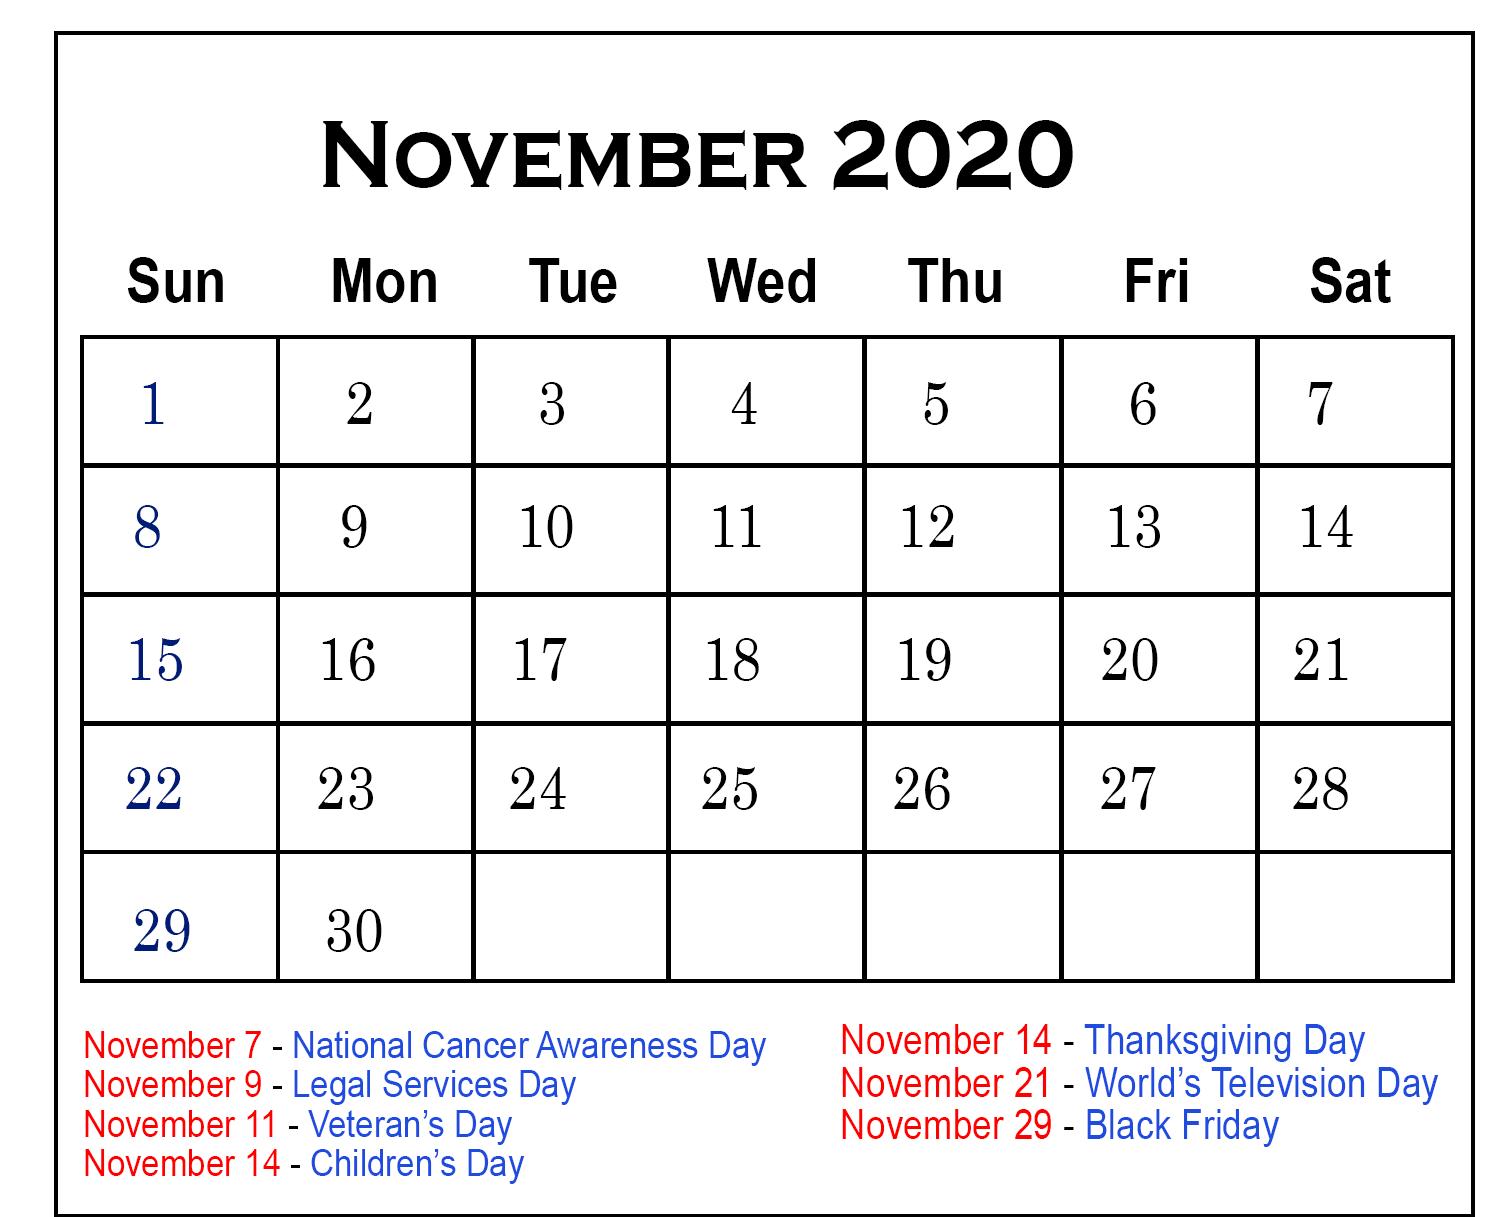 November 2020 Federal Holidays Calendar